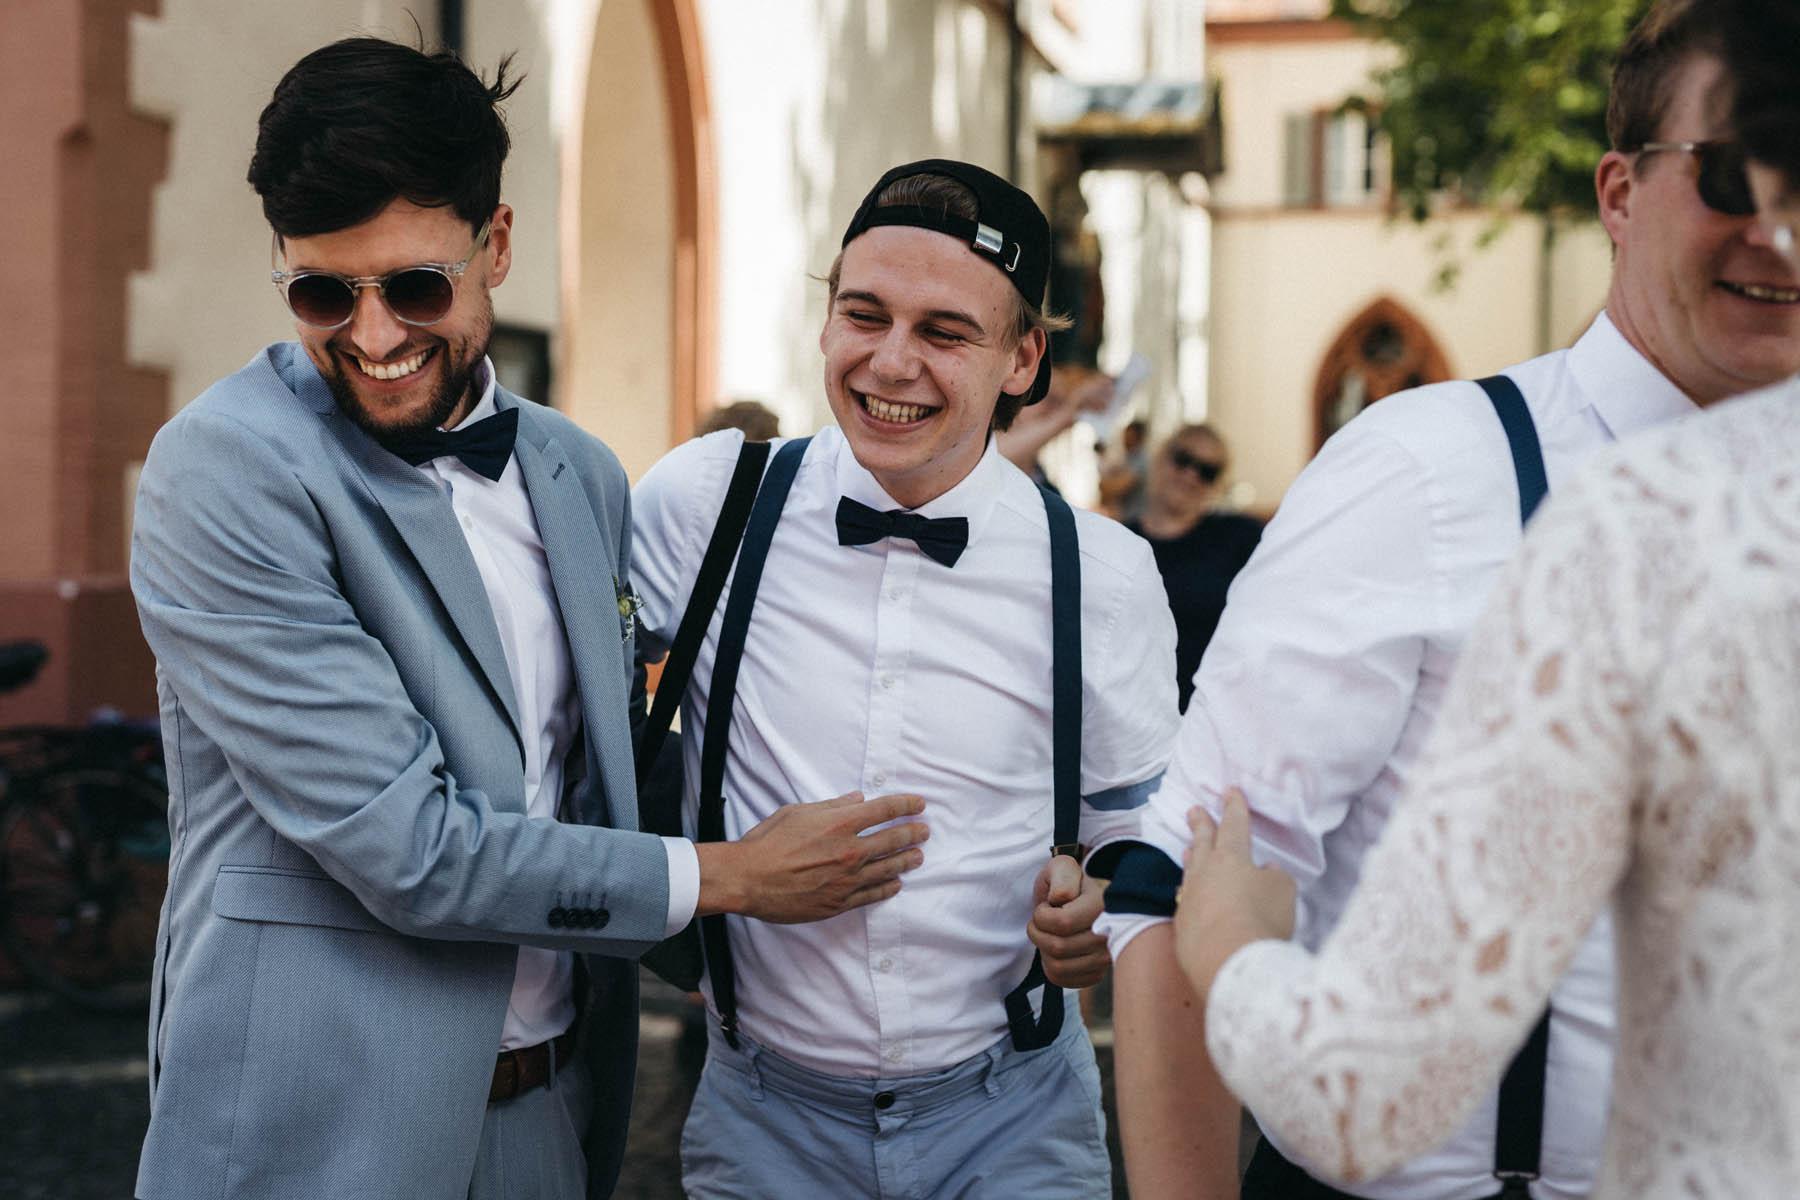 raissa simon fotografie elopement freiburg standesamt 004 - Julia + Tobias